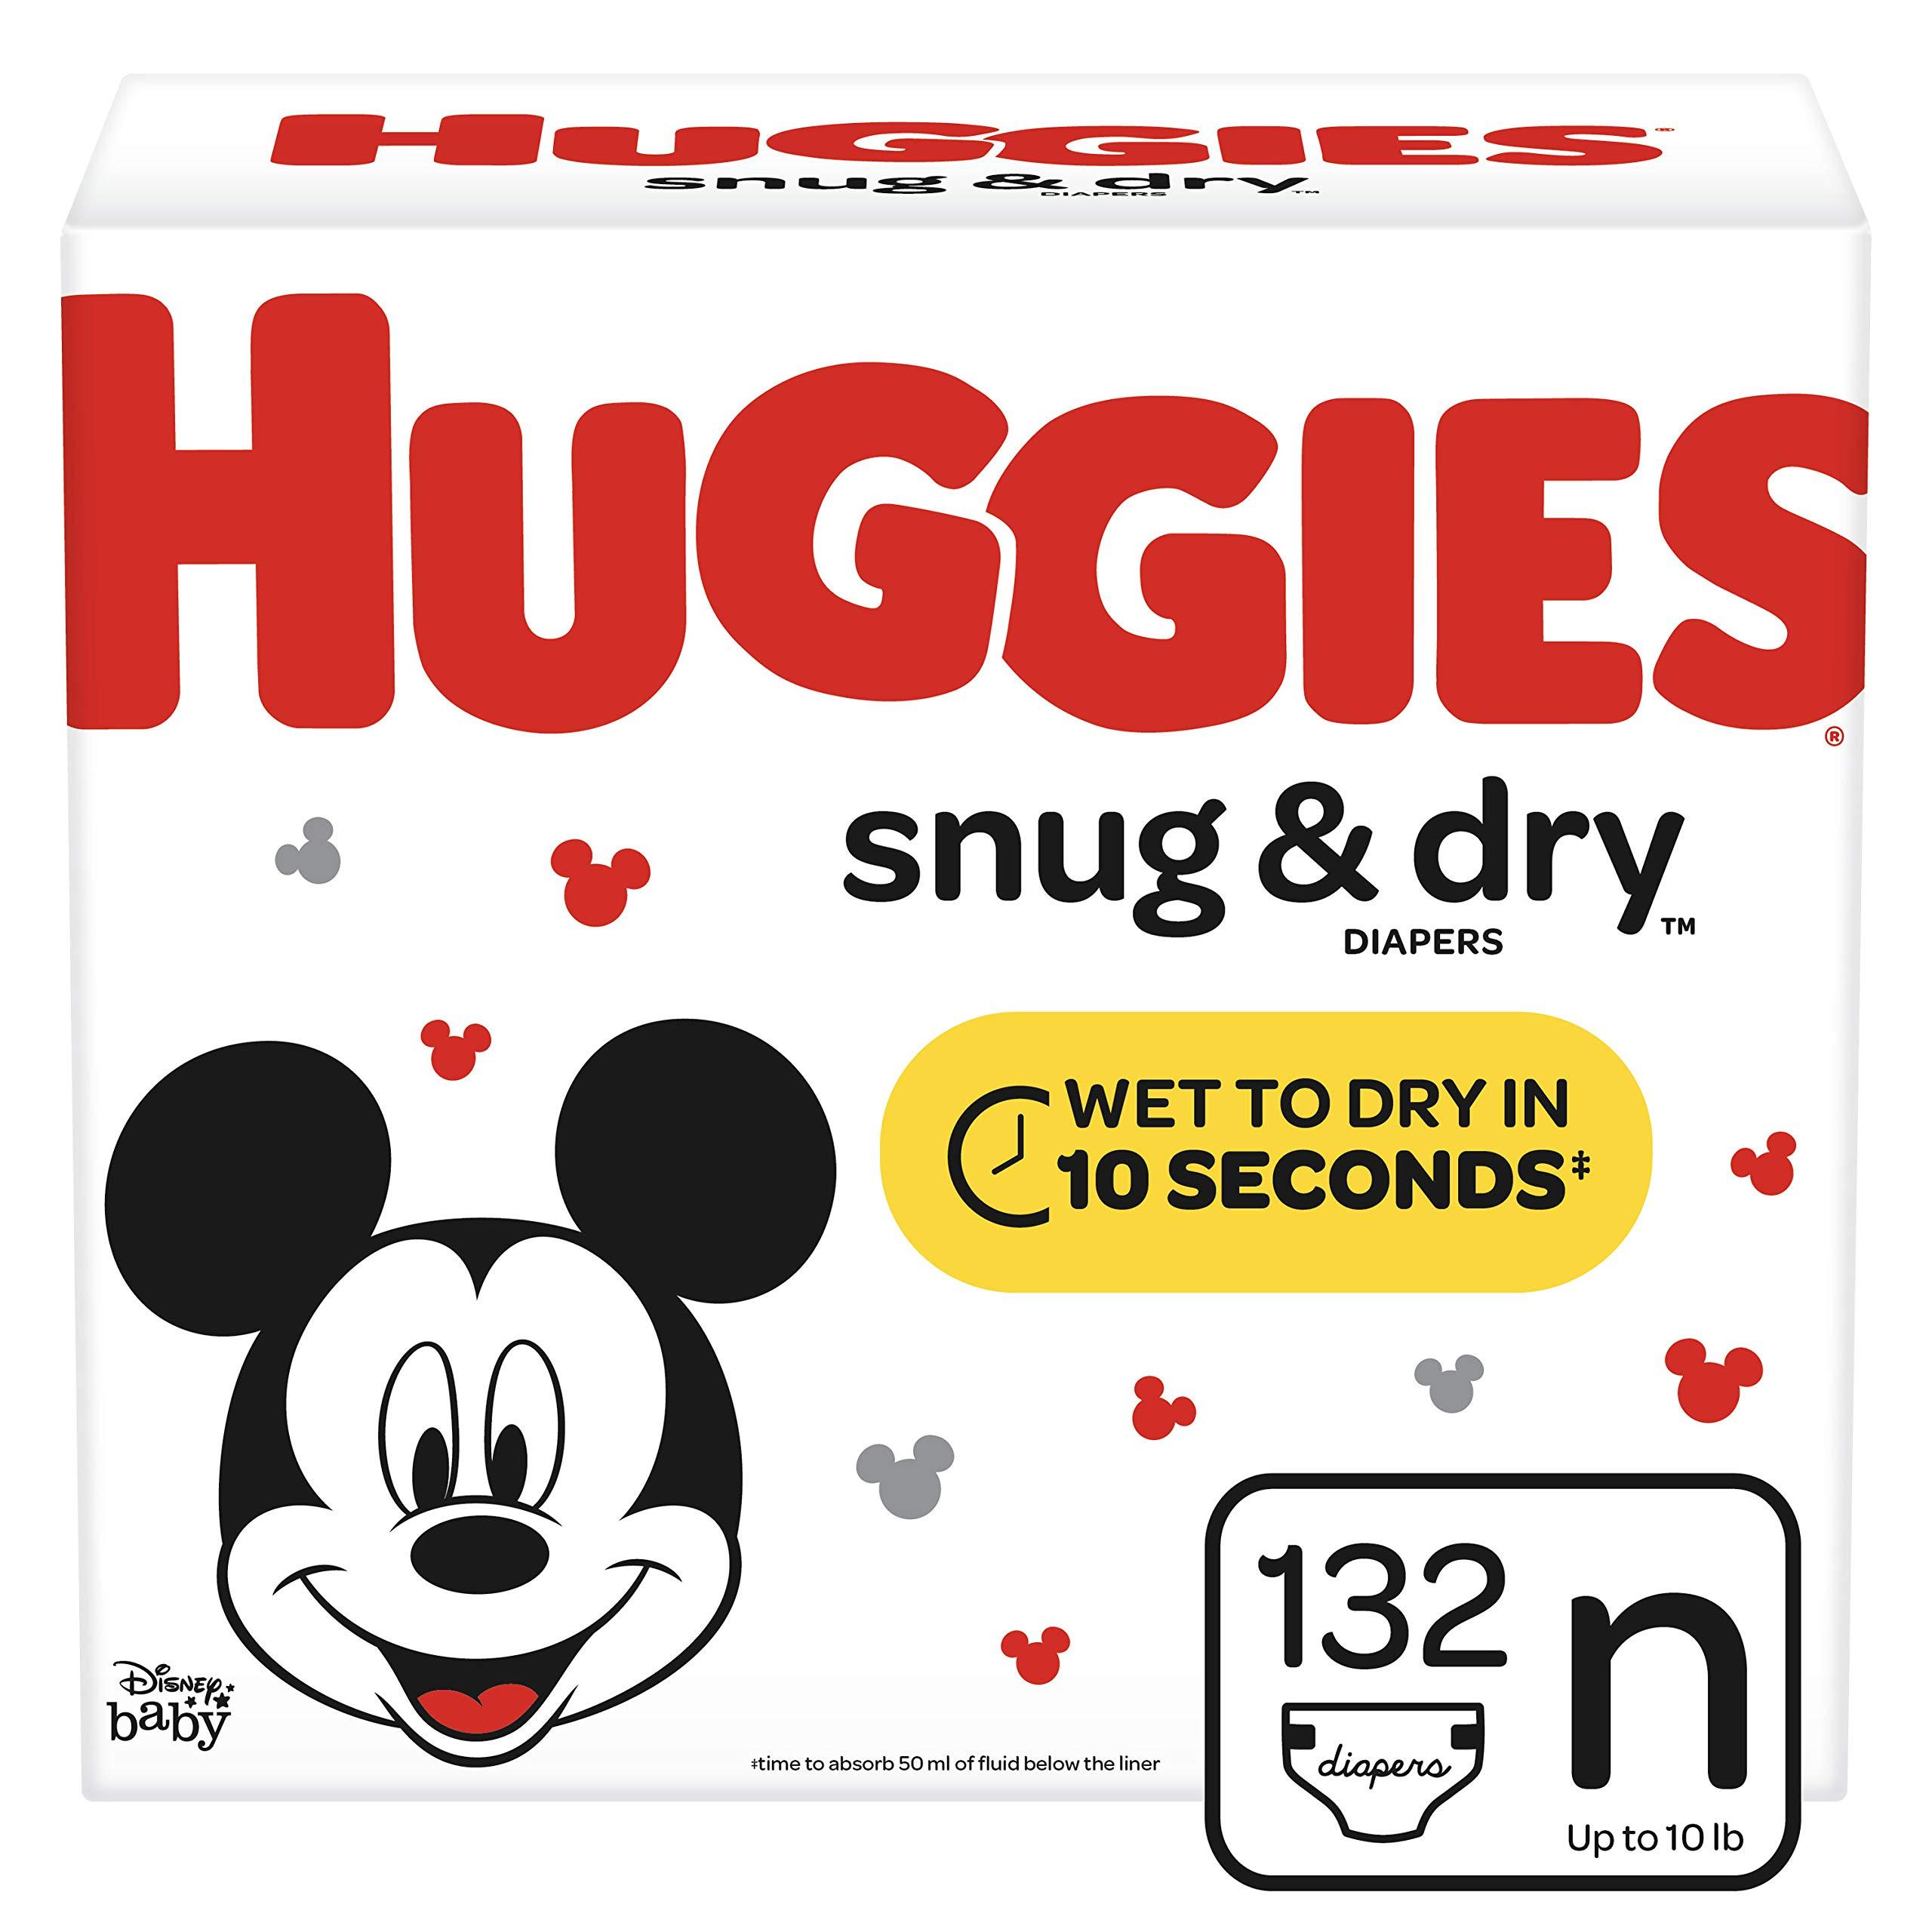 Huggies Snug & Dry Diapers, Size Newborn (up to 10 lb.), 132 Ct, Giga Jr Pack (Packaging May Vary) by HUGGIES